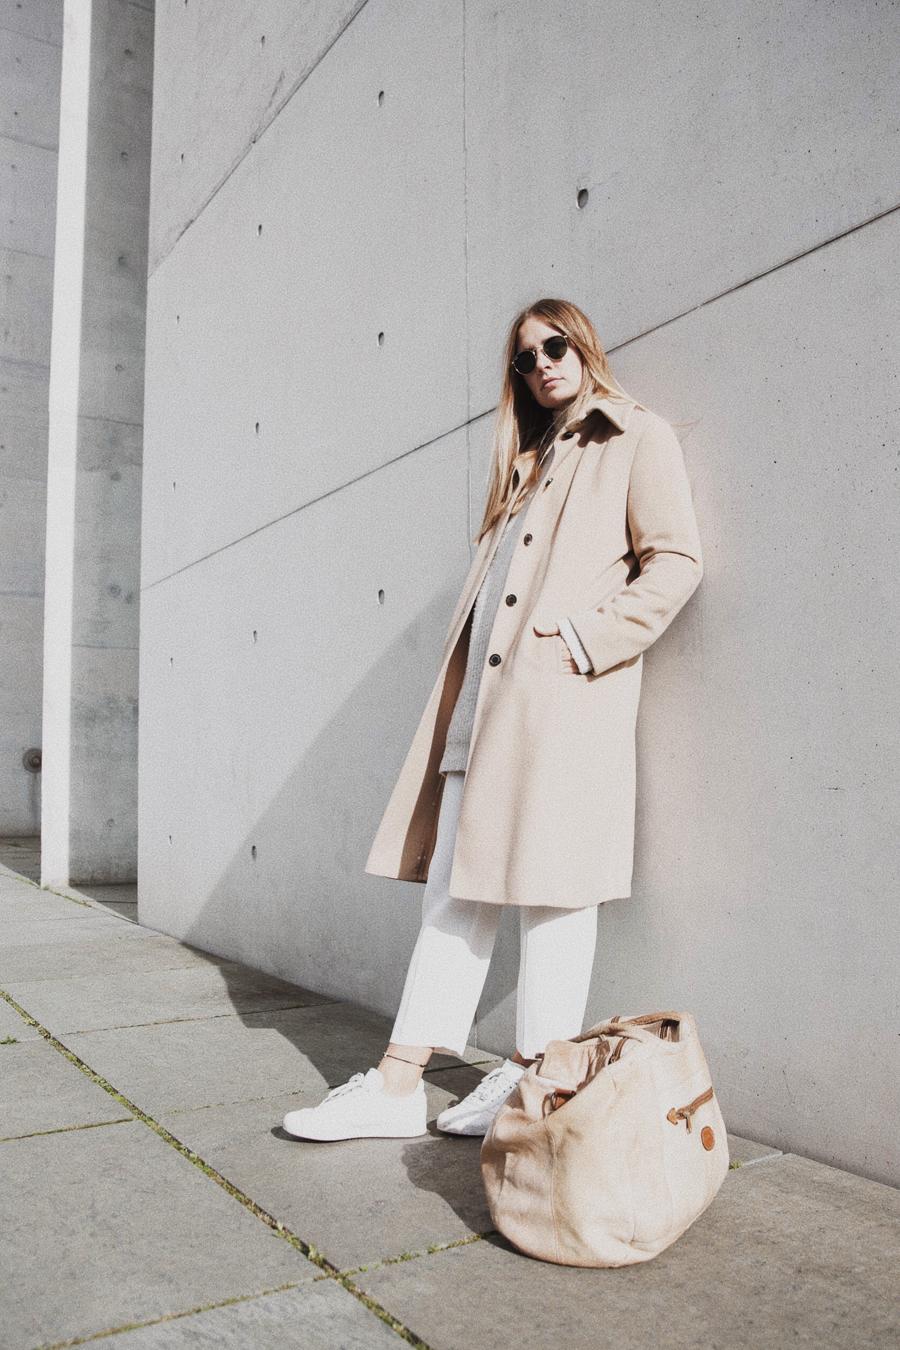 streetstyle-fashionblogger-camel-coat-romina-mey-look-total